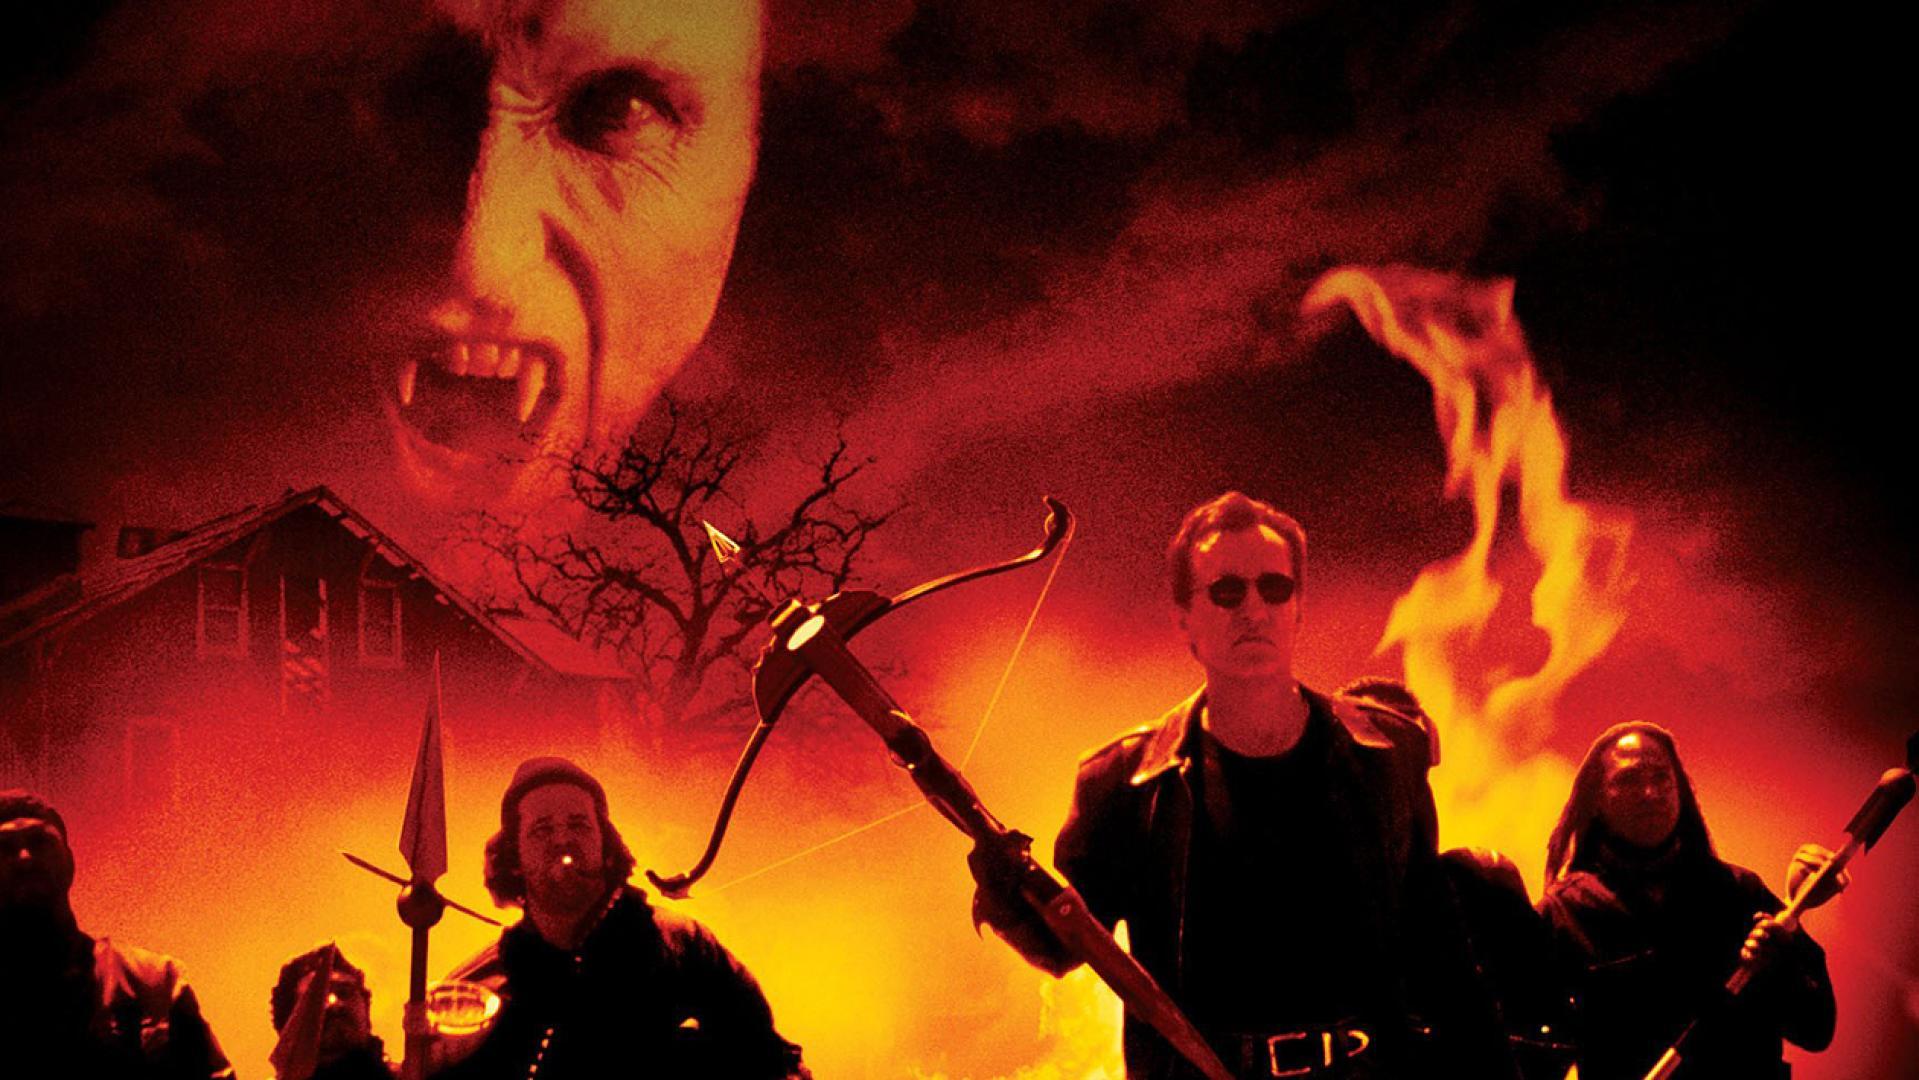 John Carpenter's Vampires - Vámpírok (1998)